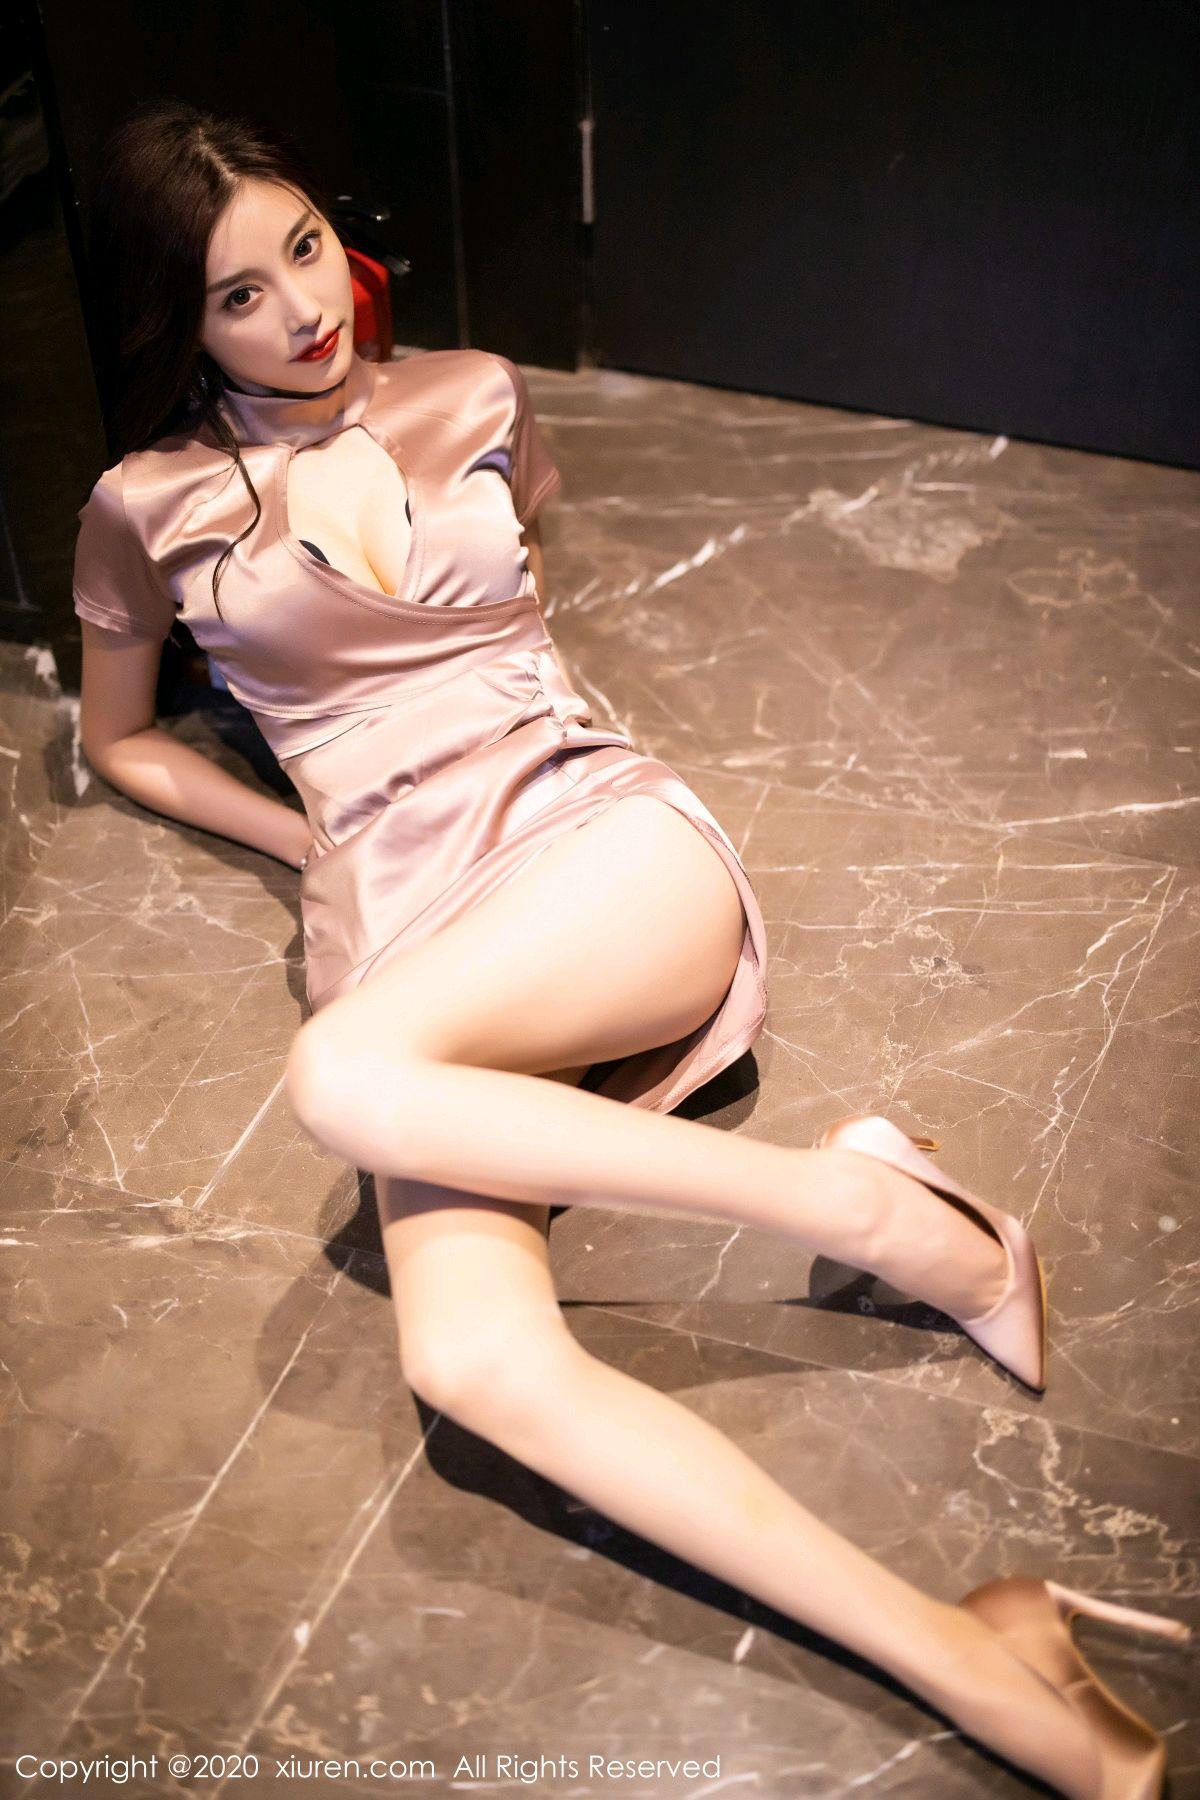 [XiuRen] Vol.2587 Yang Chen Chen 56P, Underwear, Xiuren, Yang Chen Chen